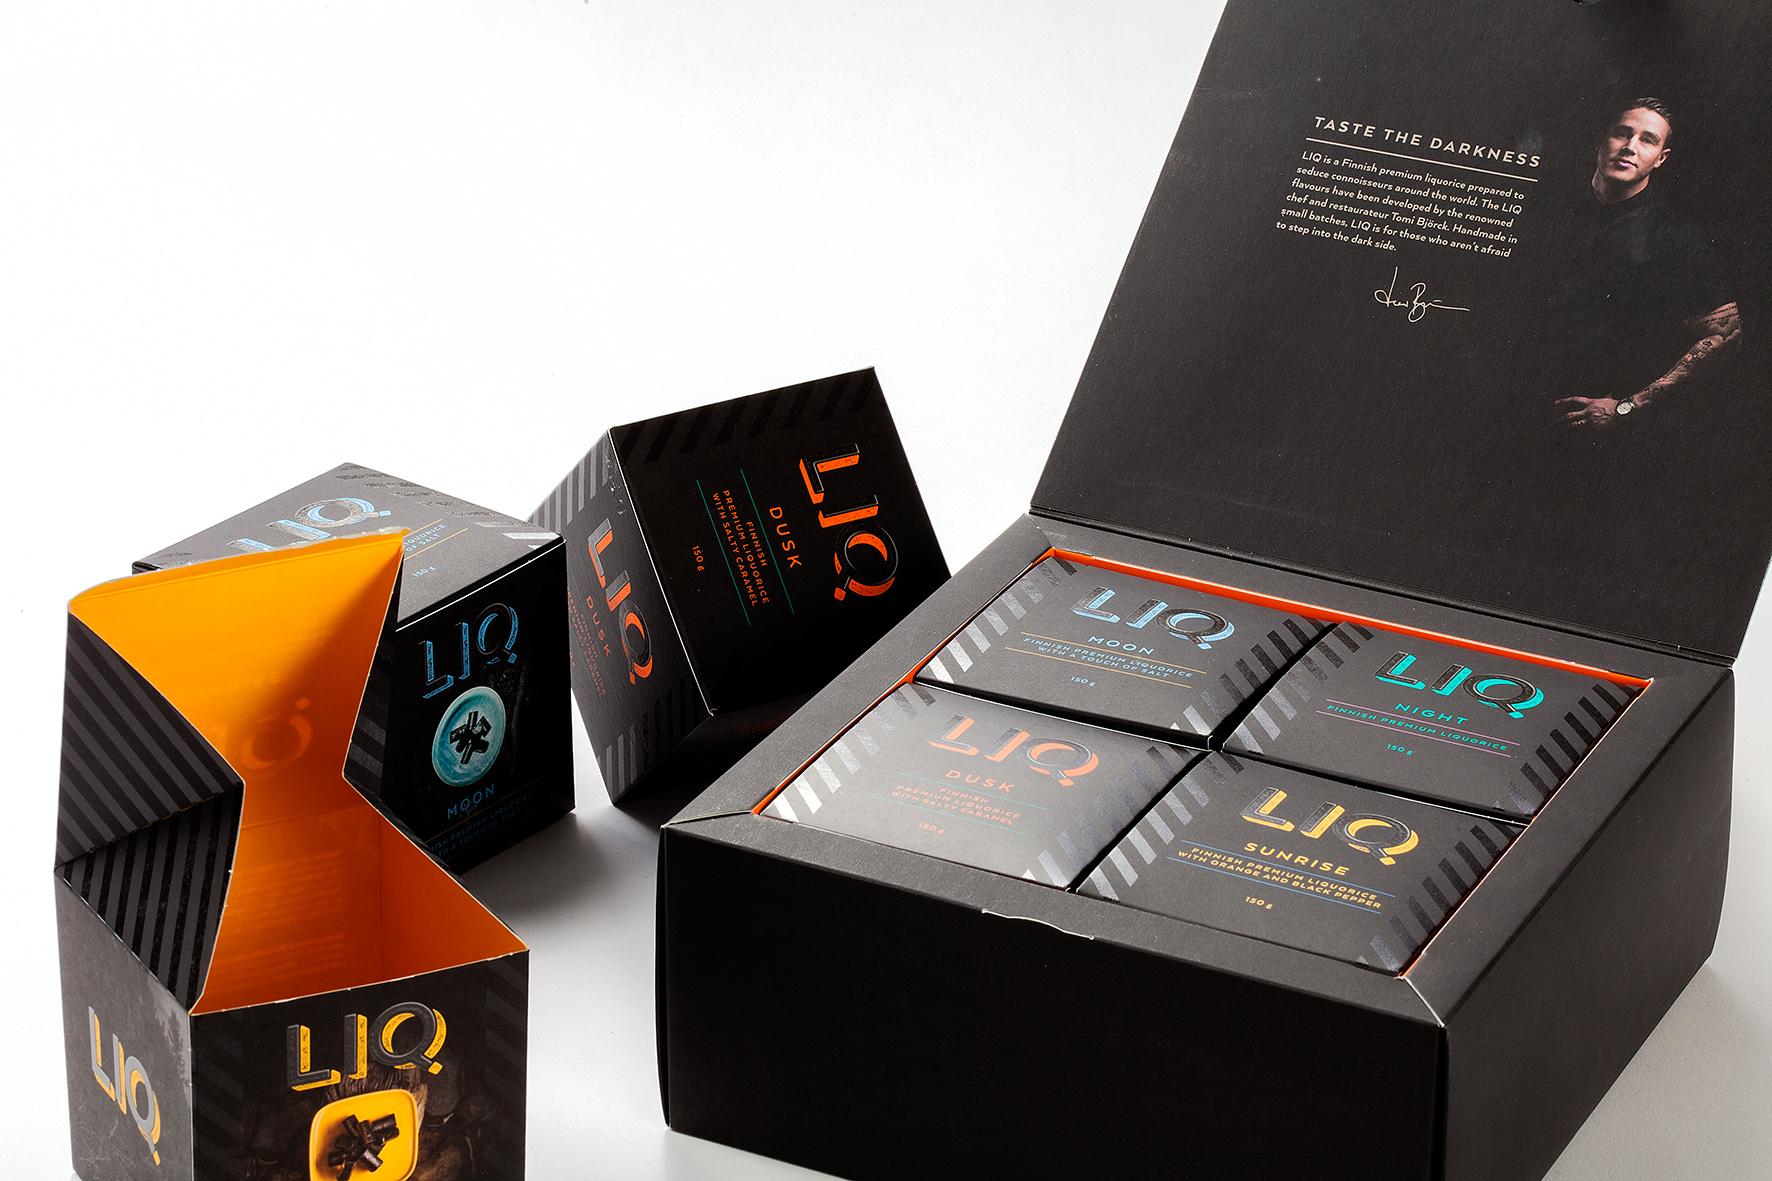 carton-award-image 140360